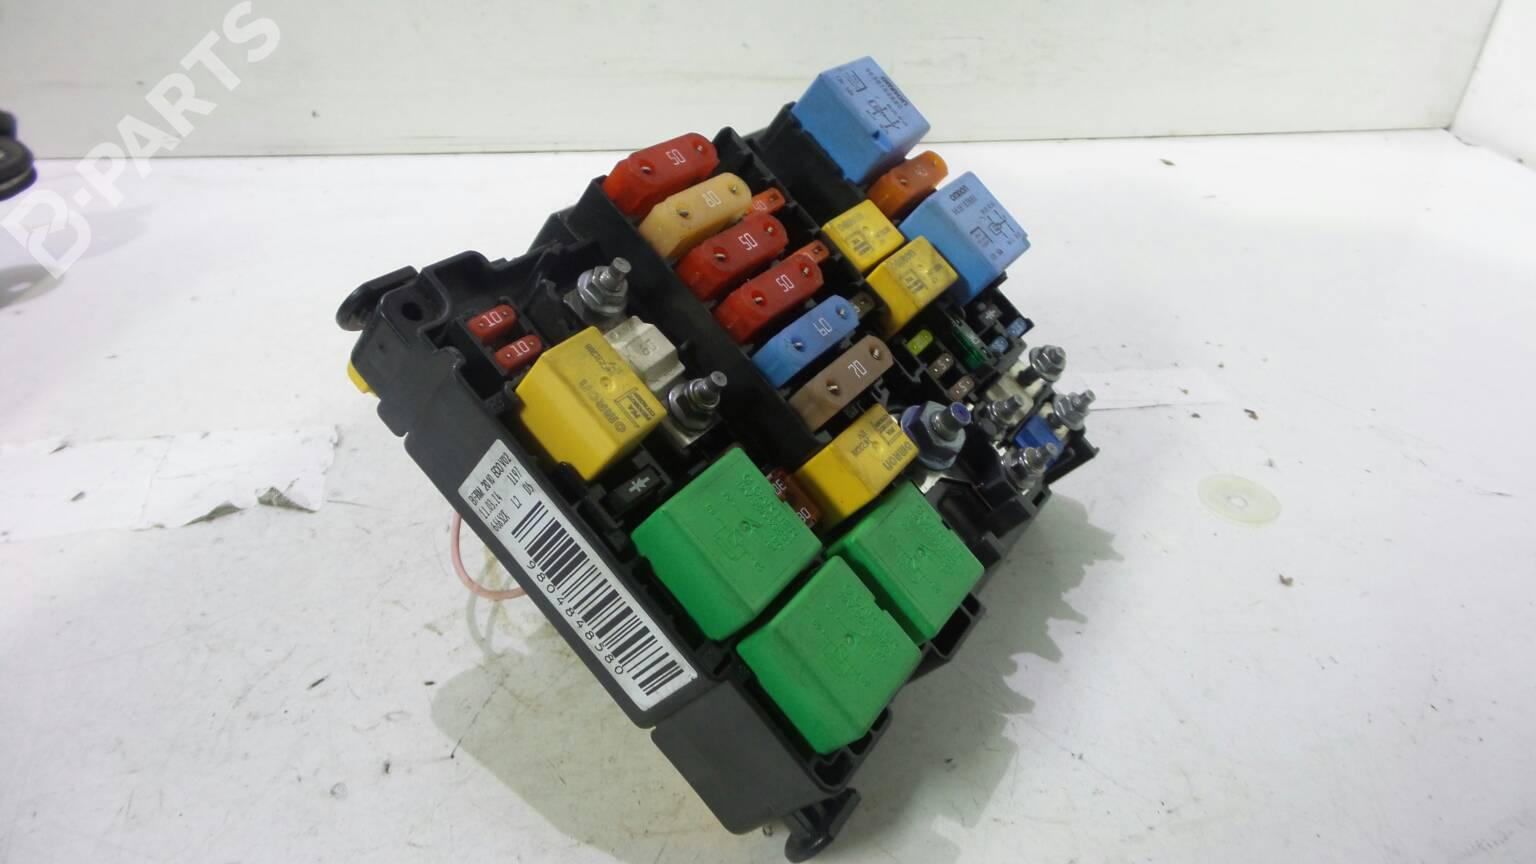 ... Fuse Box 9804848580 PEUGEOT, 308 II 1.6 HDi / BlueHDi 115 (115hp),